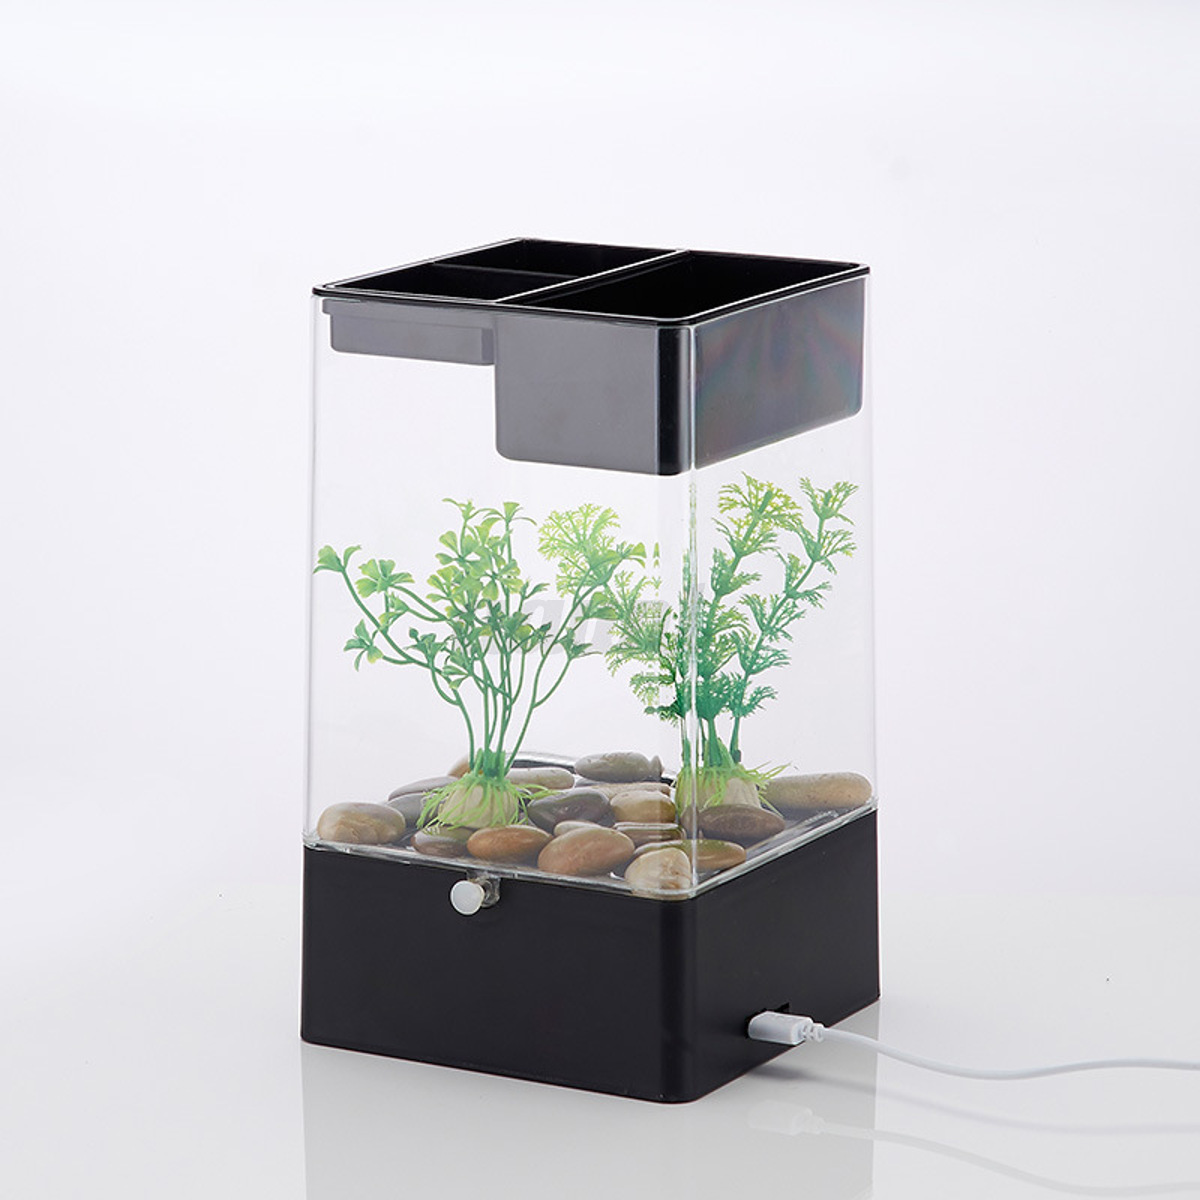 Led Light Square Usb Interface Aquarium Ecological Office